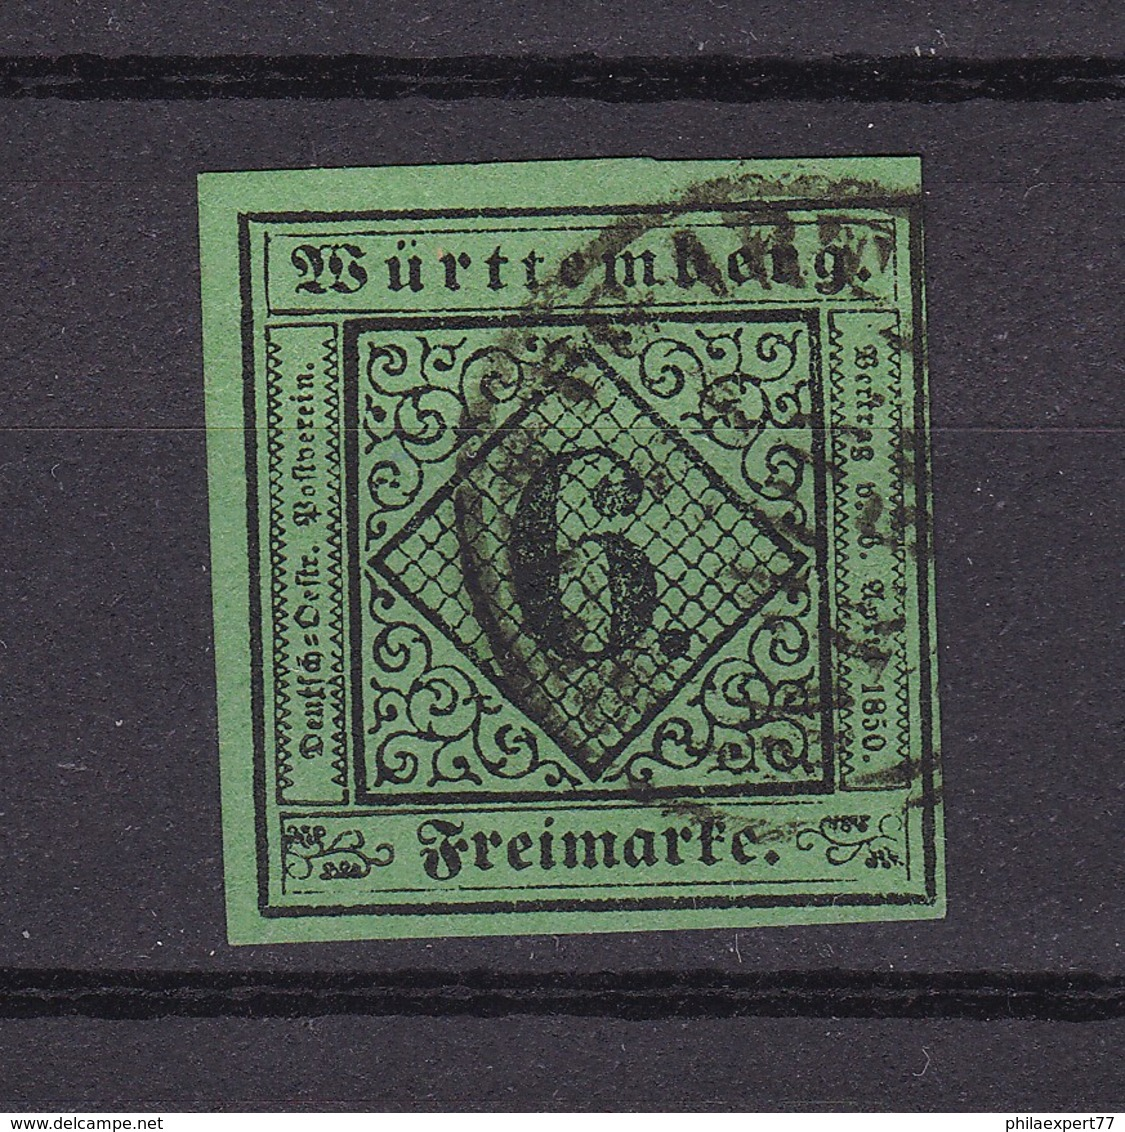 Wuerttemberg - 1851/52 - Michel Nr. 3 - 40 Euro - Wuerttemberg